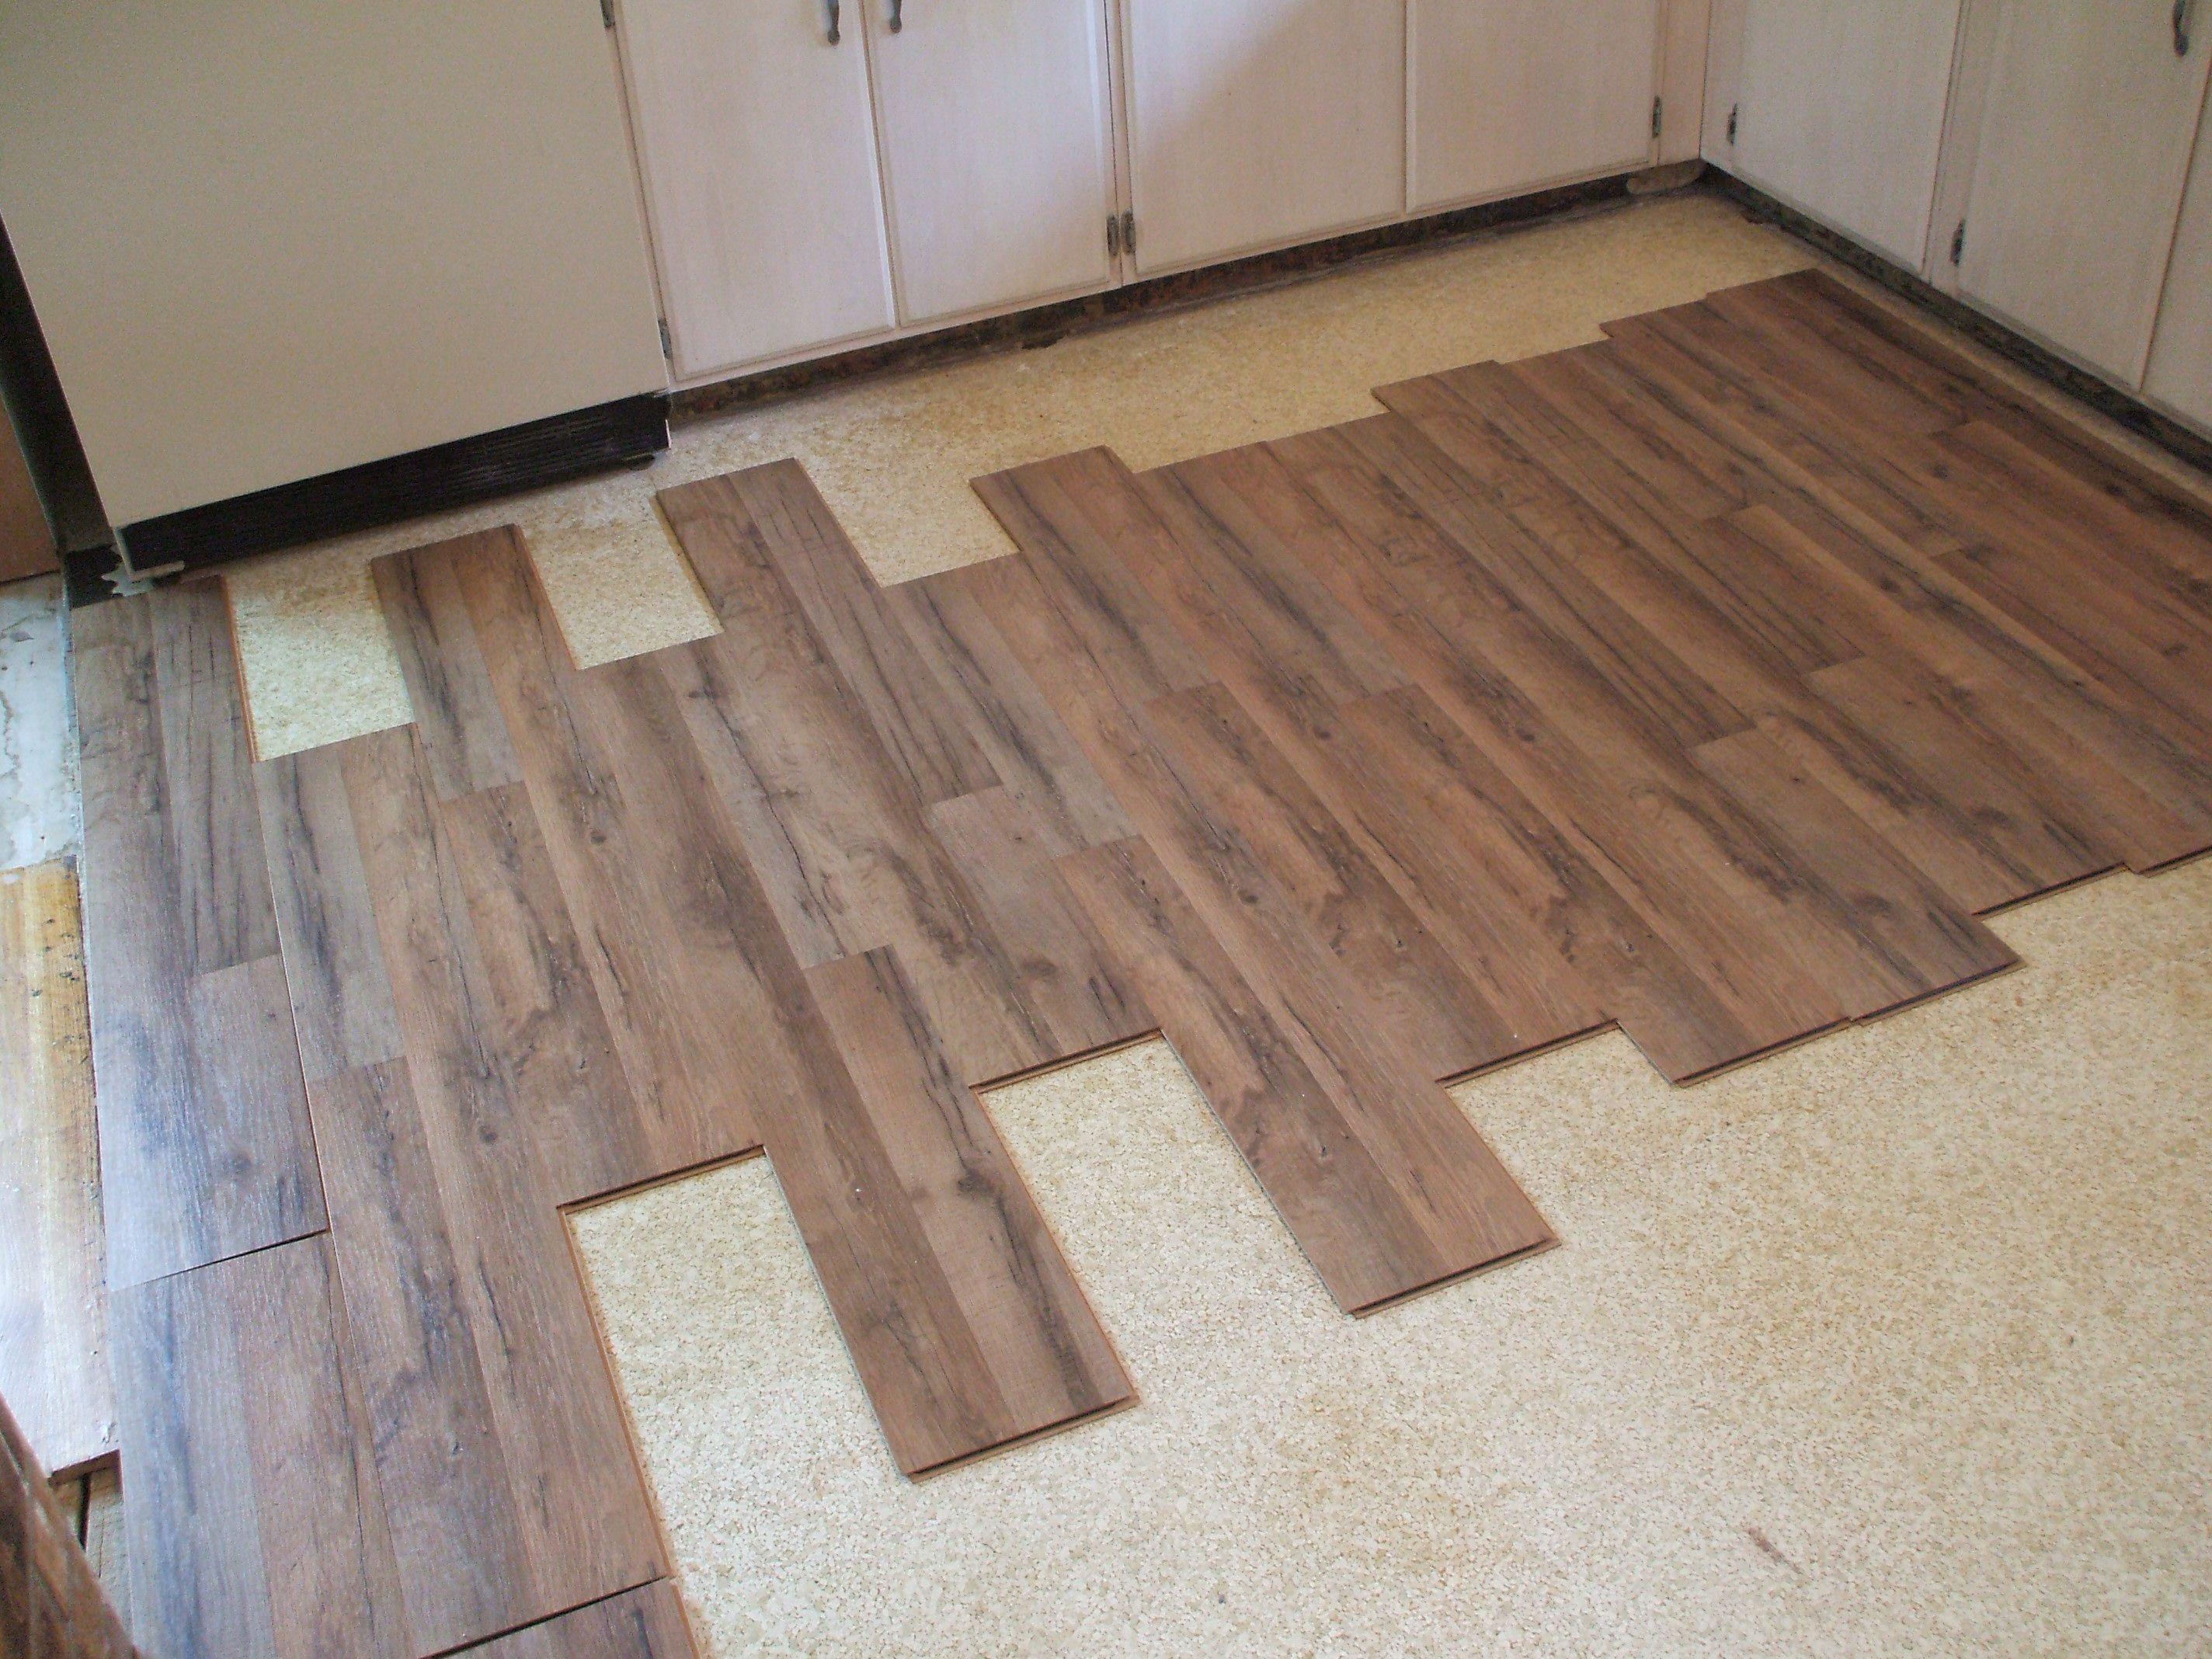 labor price to install hardwood floors of laminate flooring installation made easy inside installing laminate eyeballing layout 56a49d075f9b58b7d0d7d693 jpg